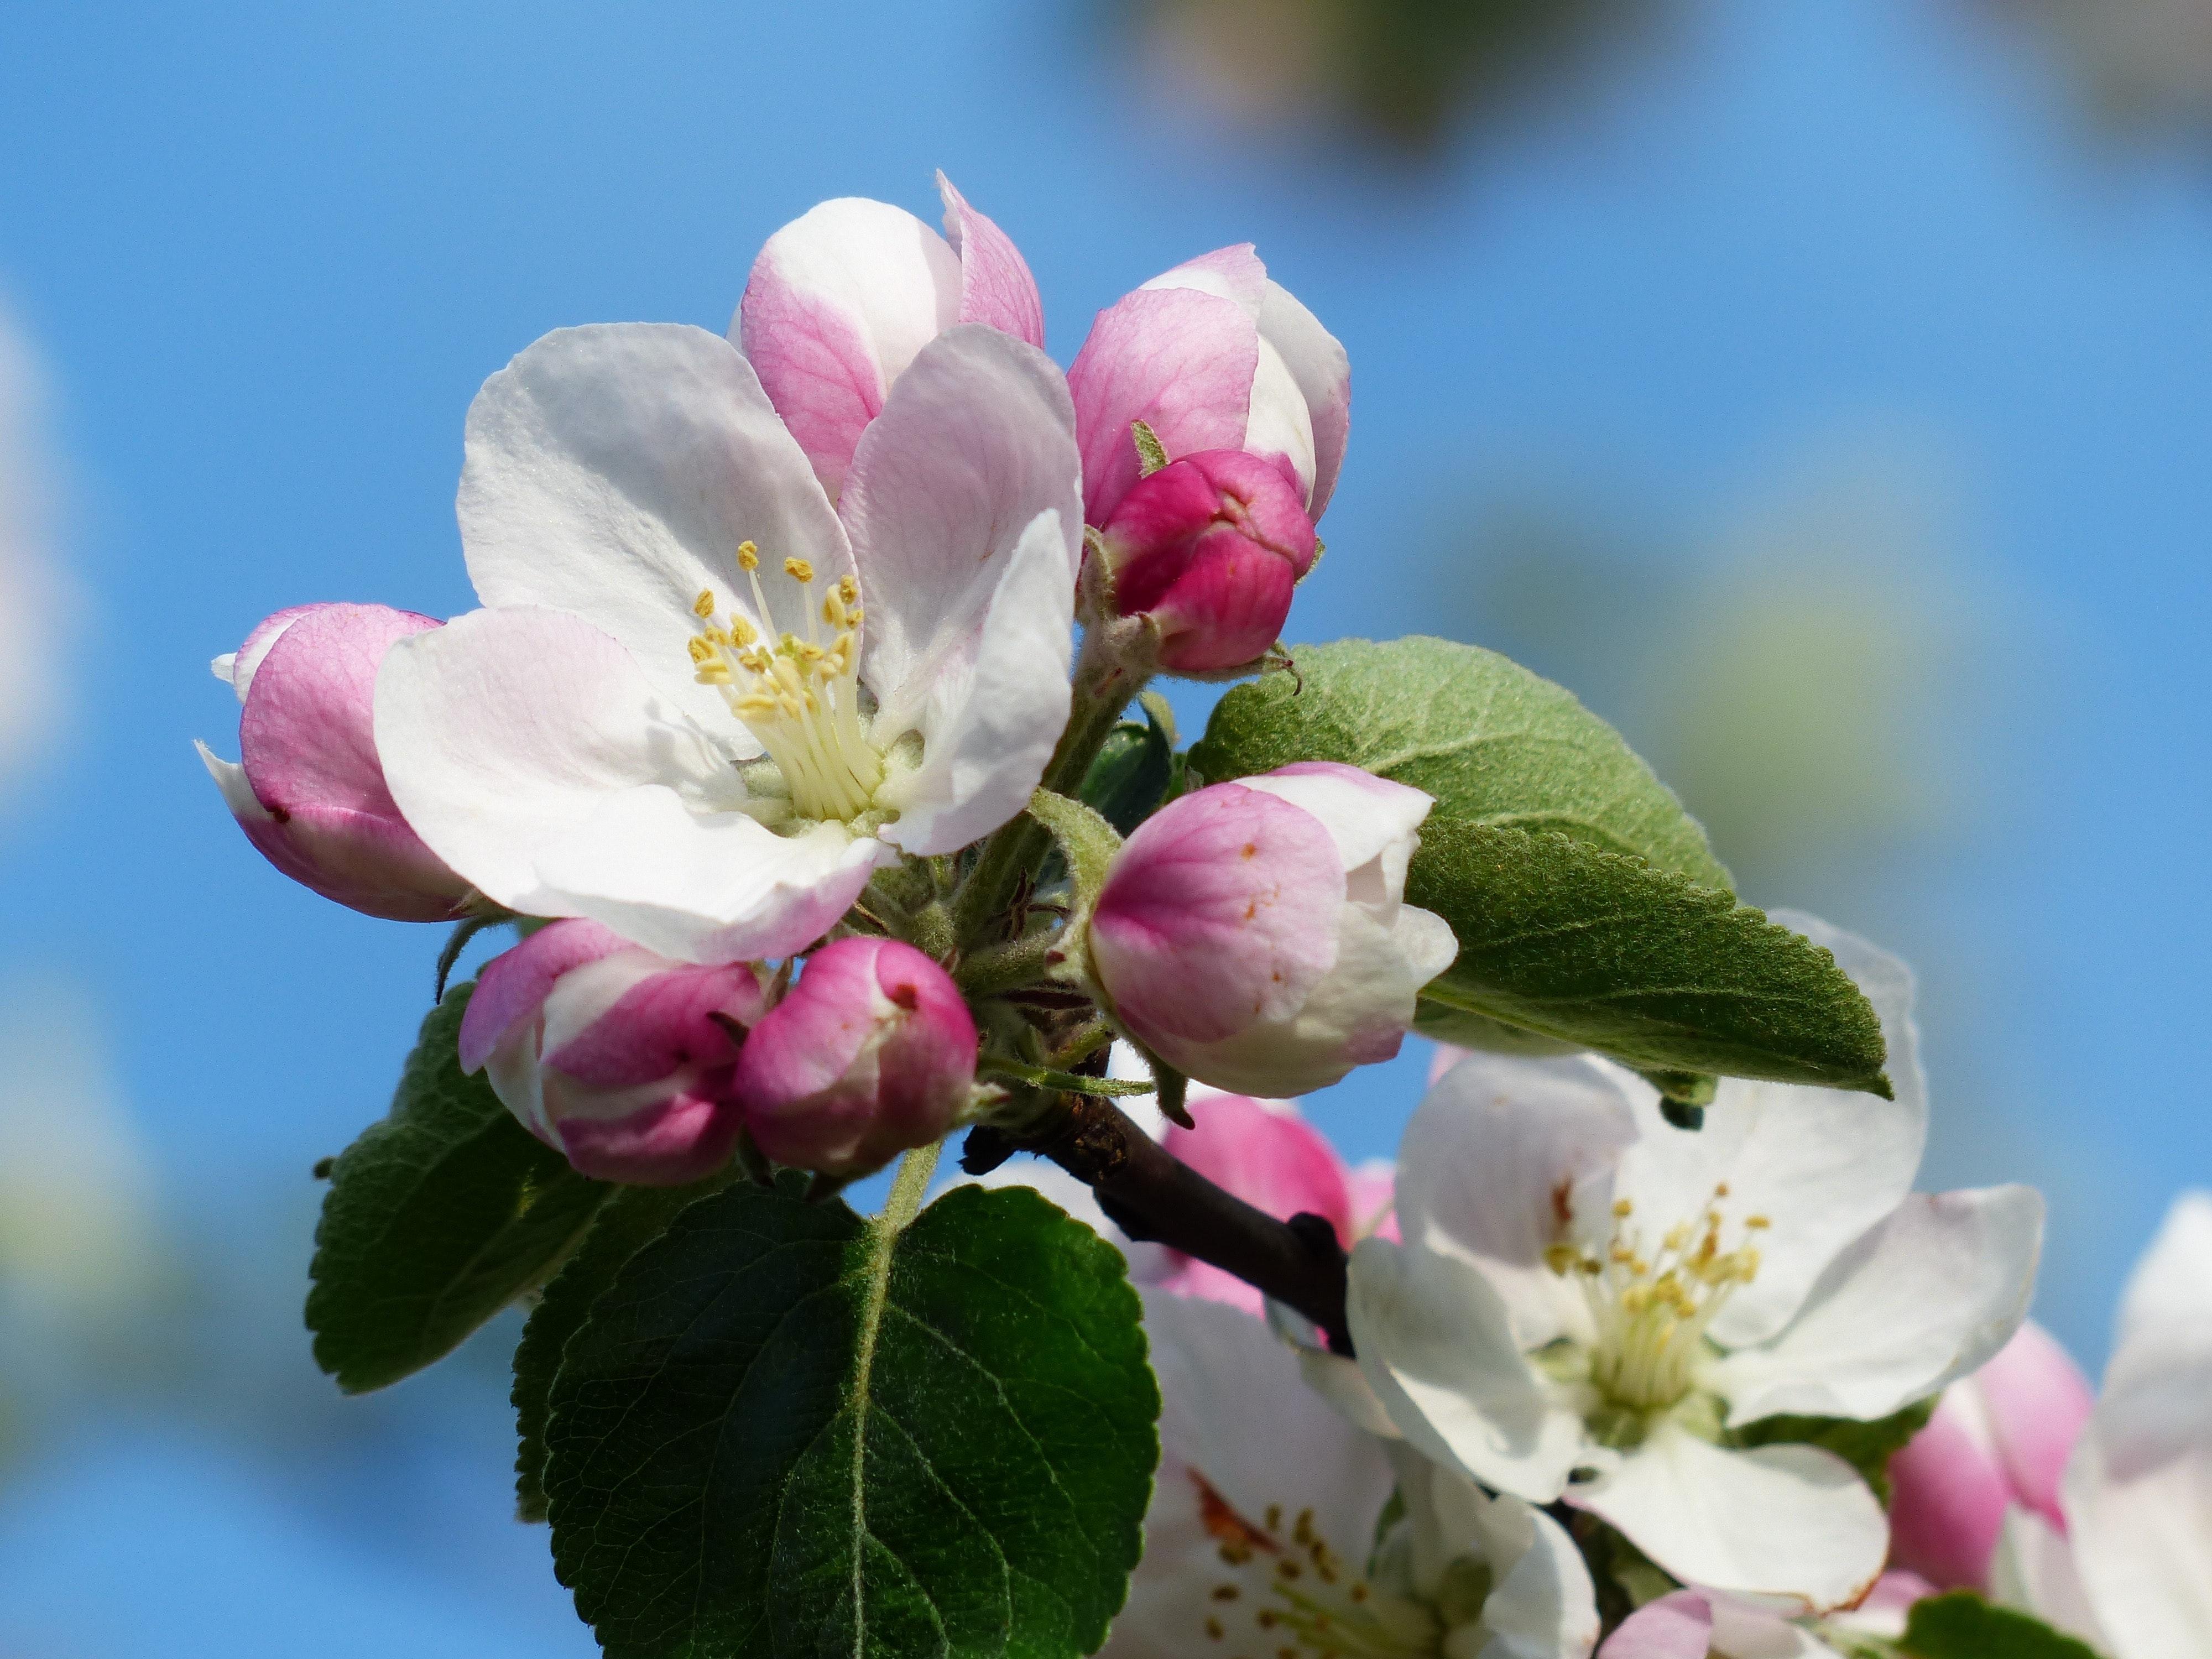 bloom-blossom-close-up-68169